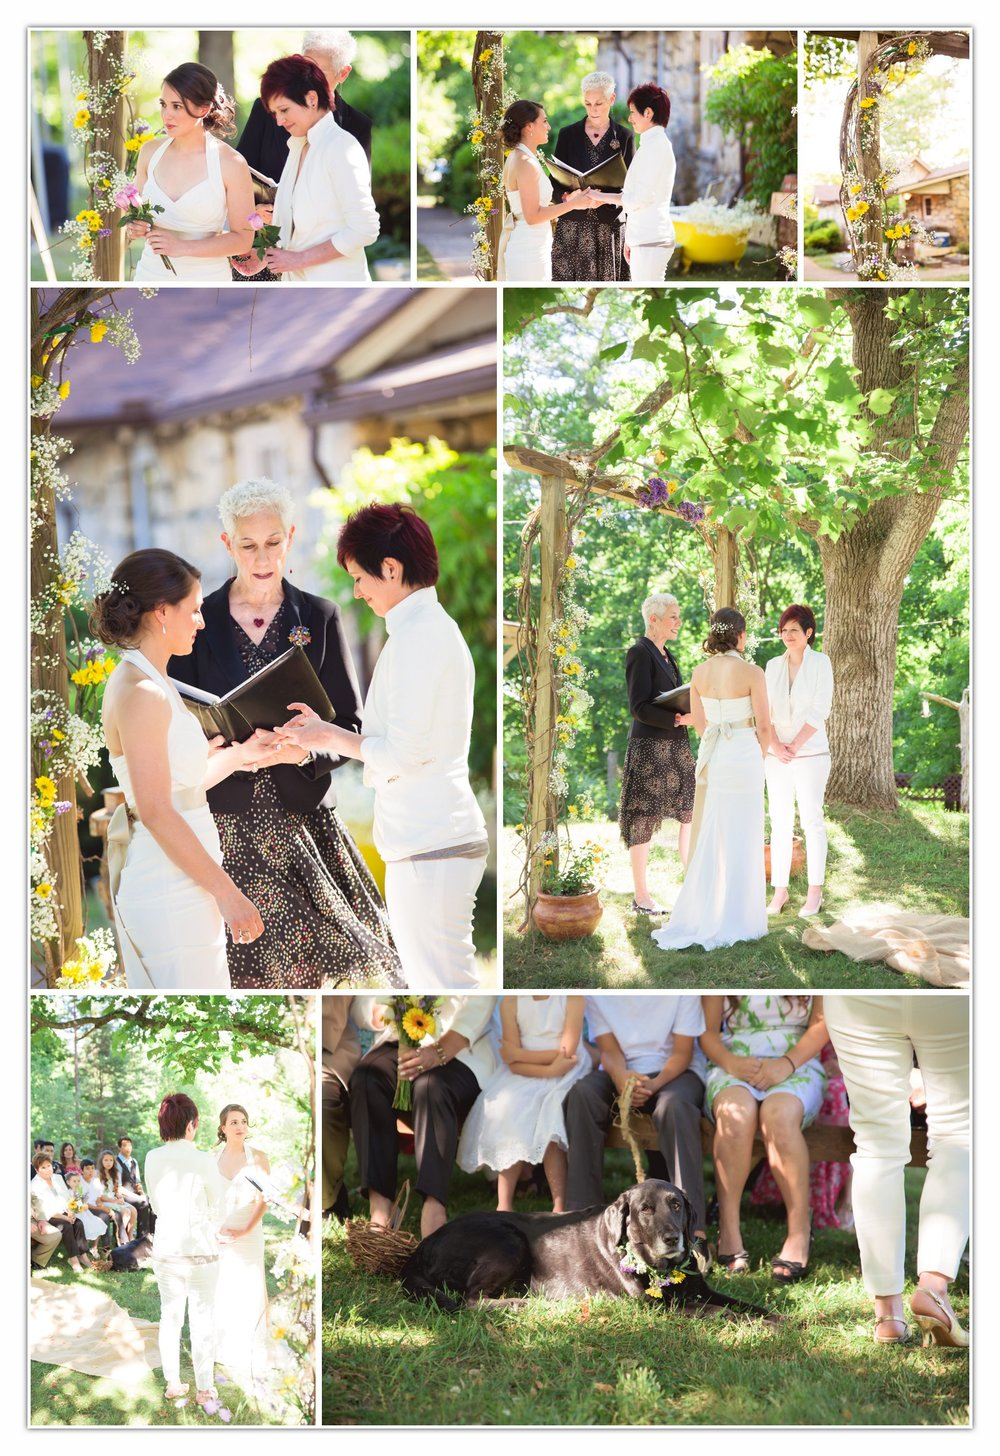 Donnellan Wedding Blog 12.jpg